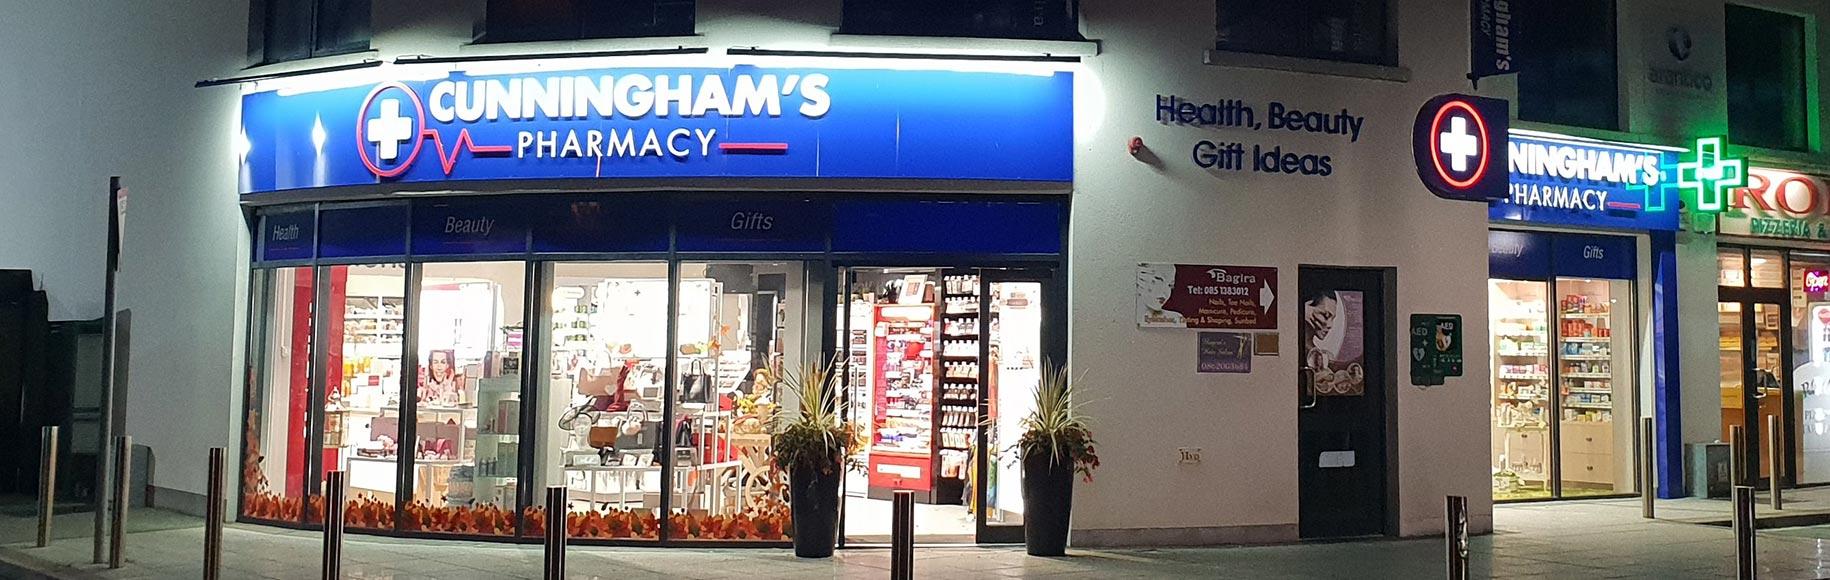 Cunningham's Pharmacy exterior shop